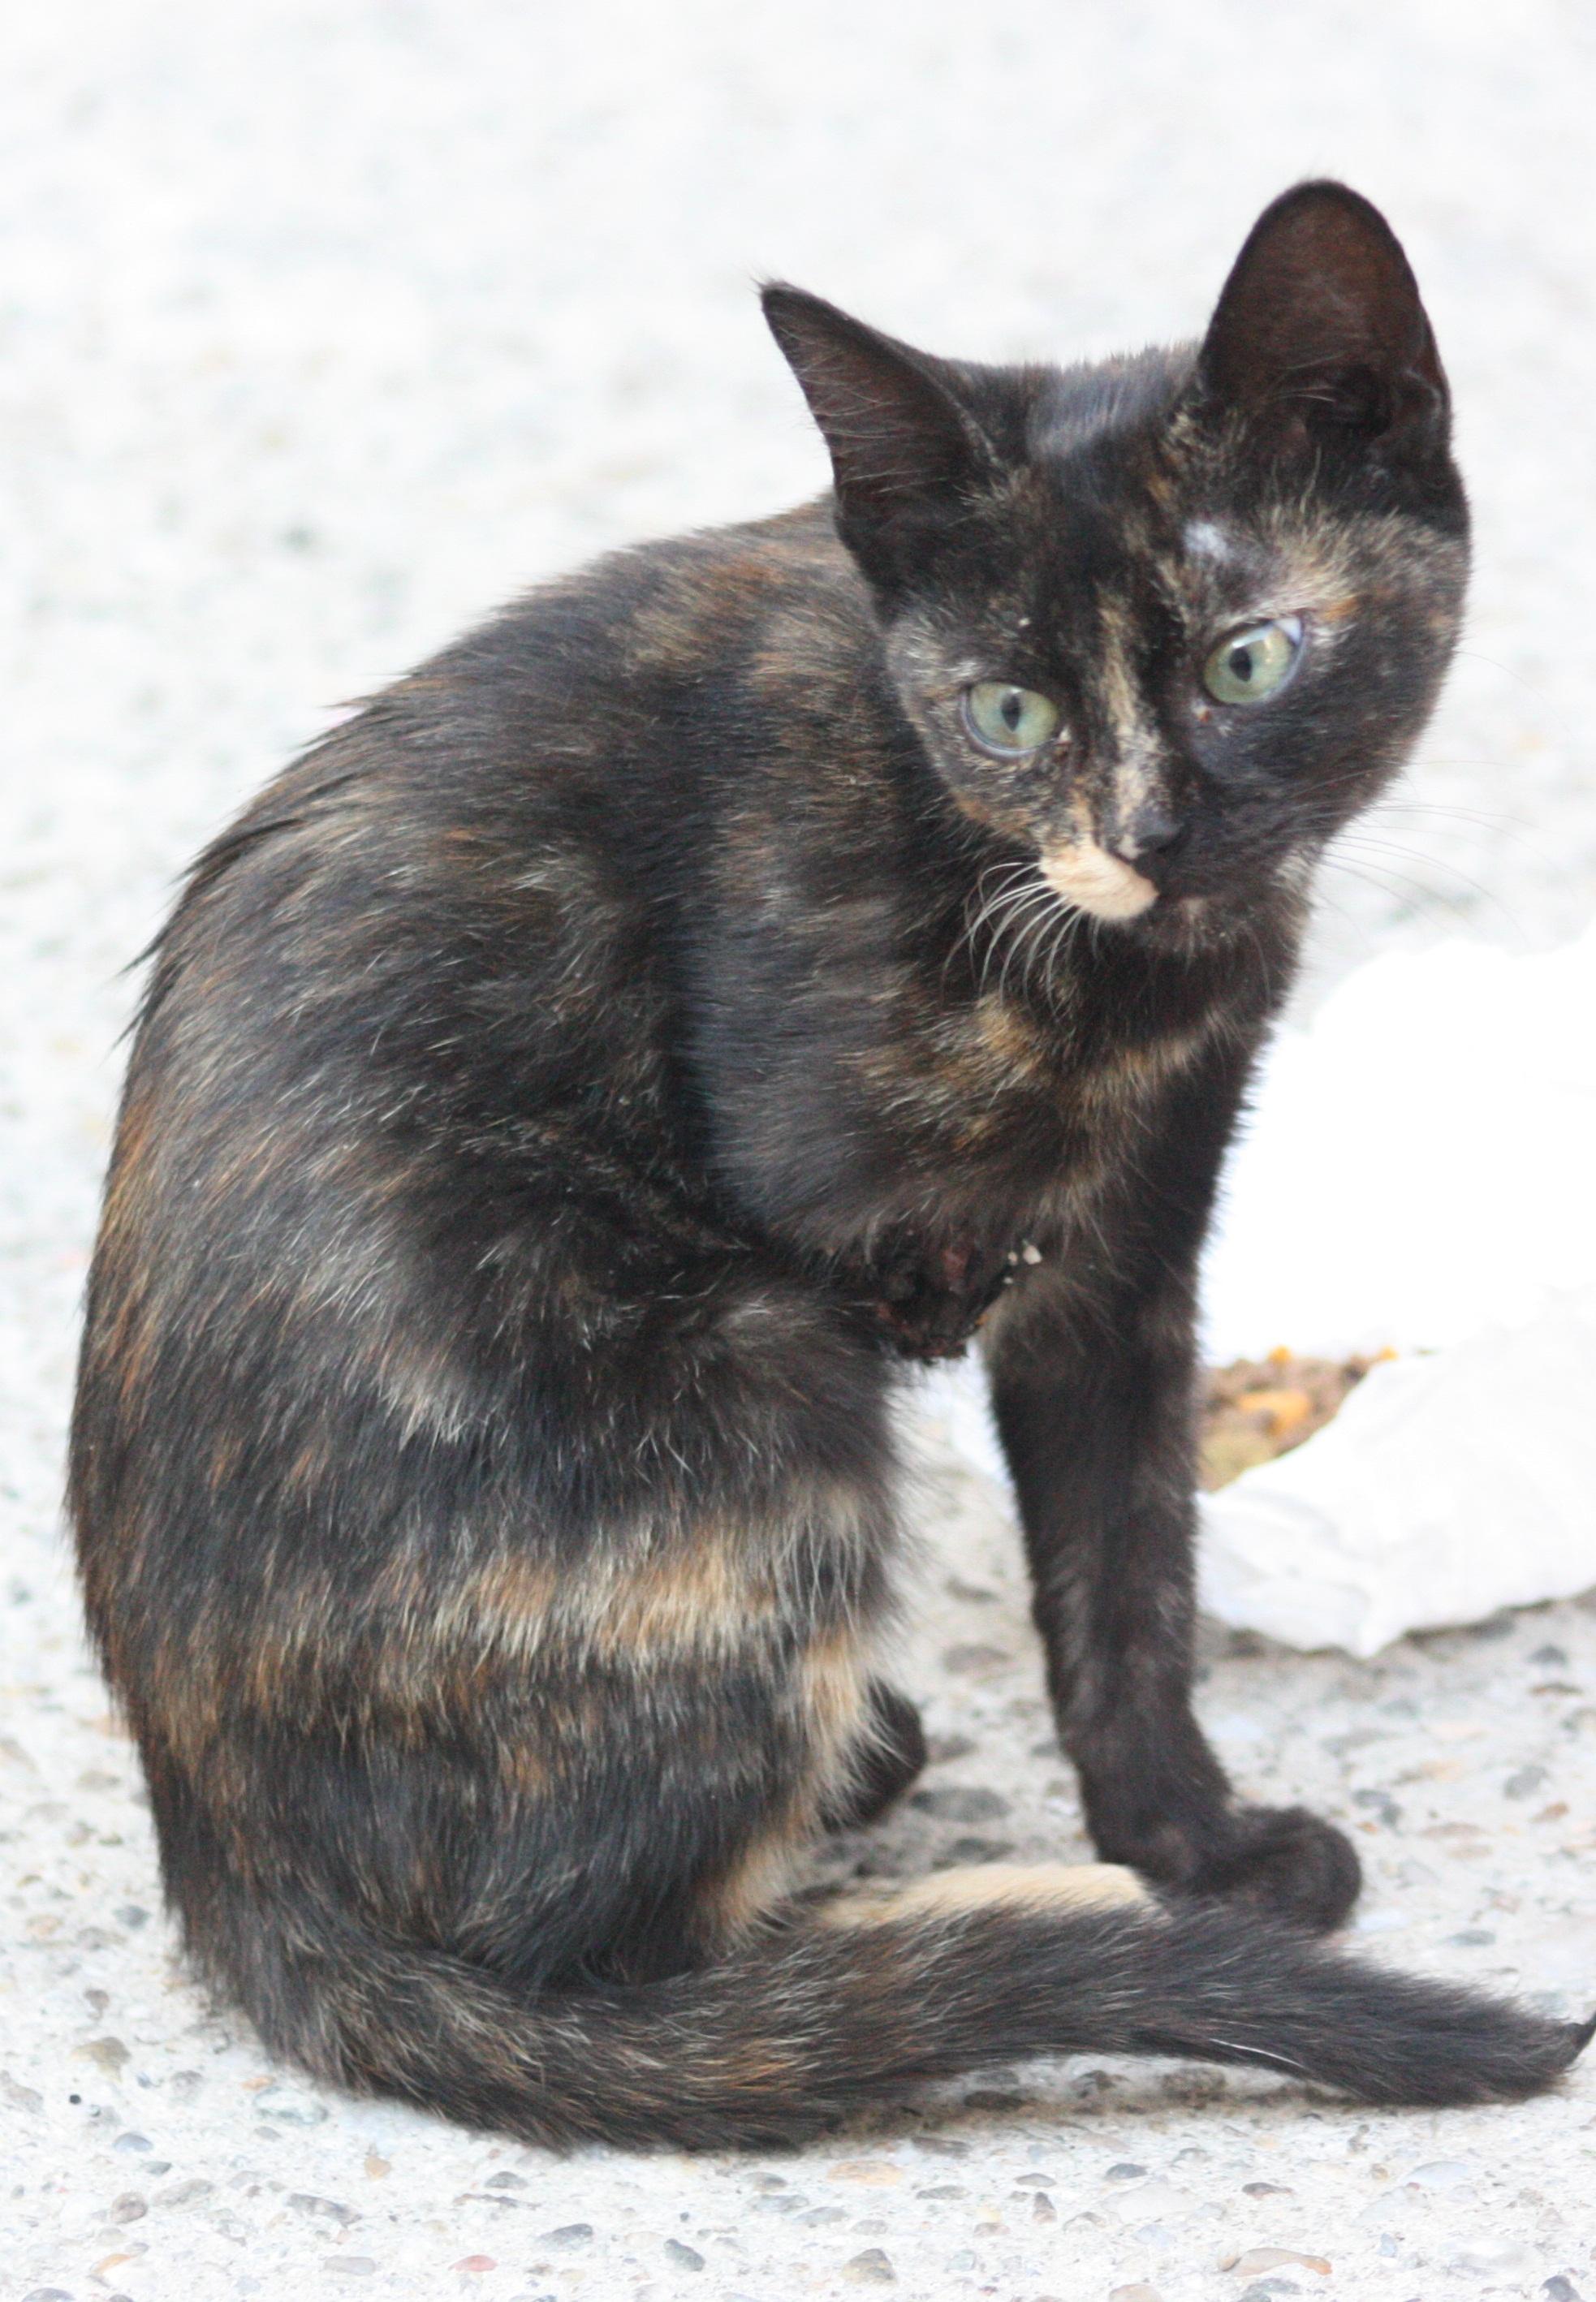 pui pisica infirm-foto -Mihai Neacsu (4)